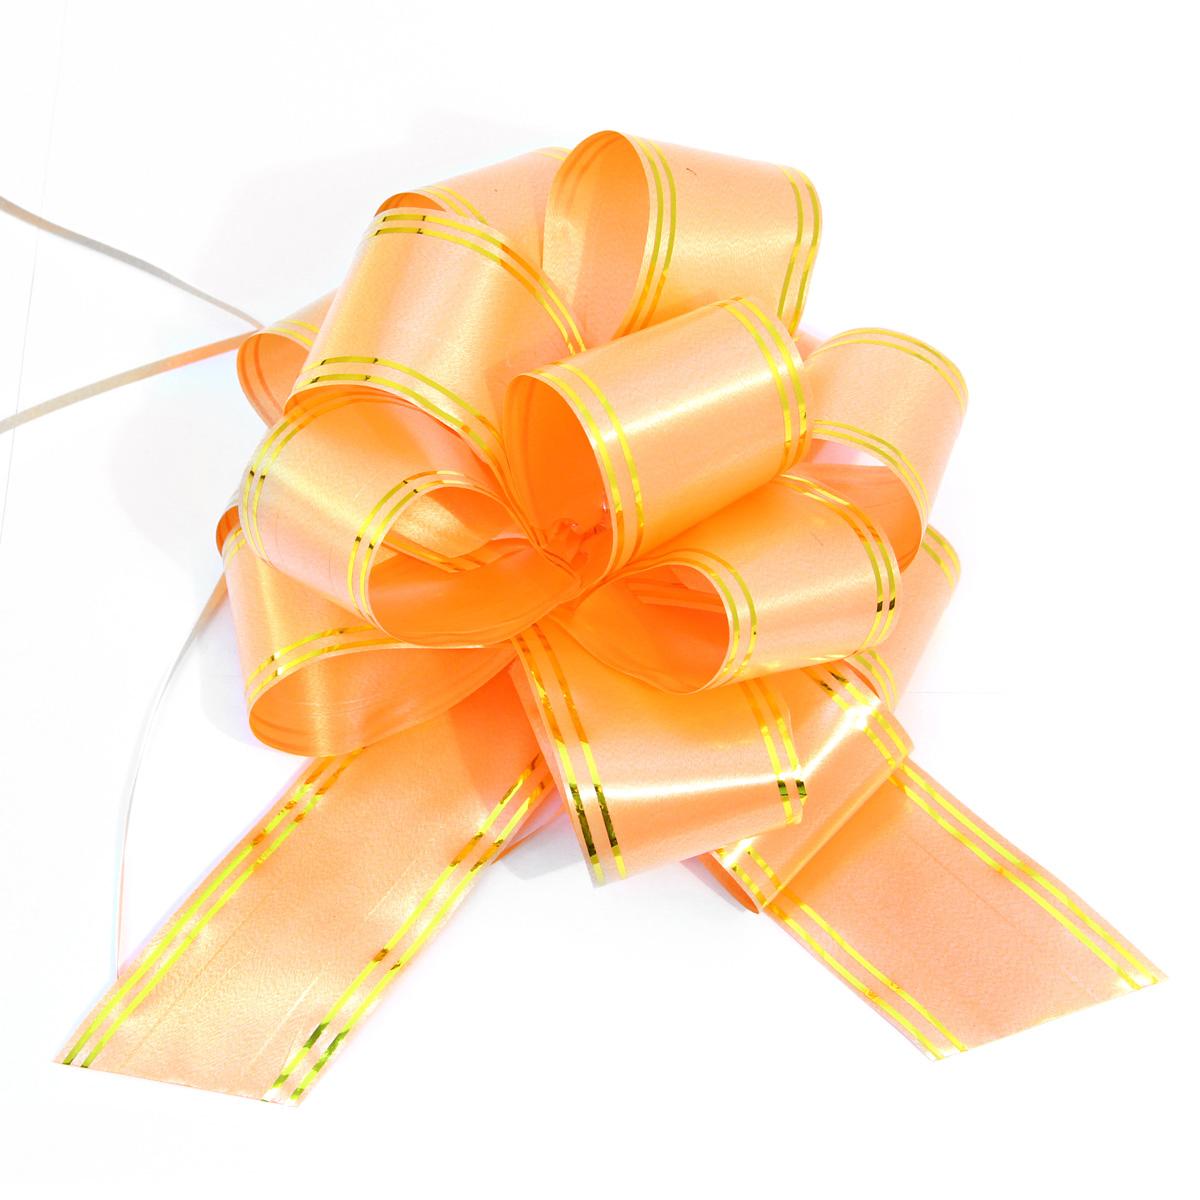 Бант упаковочный Veld-Co Шар, цвет: оранжевый, 5 х 148 см, 10 шт набор упаковочных бантиков veld co 1 4 х 25 см 10 шт